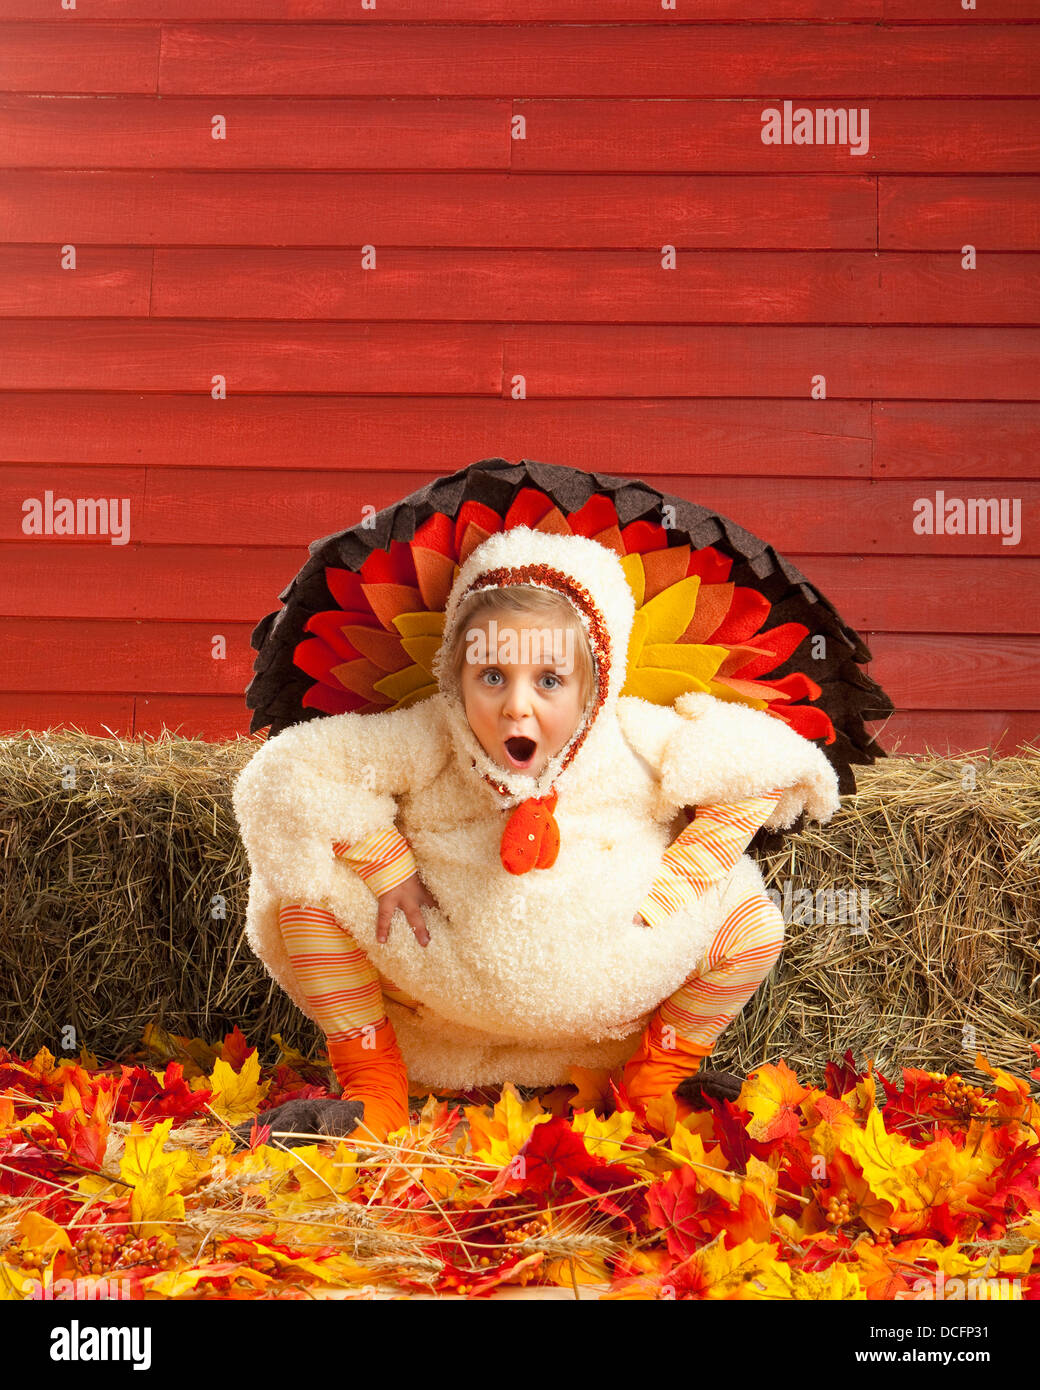 Turkey Costume Stock Photos & Turkey Costume Stock Images - Alamy